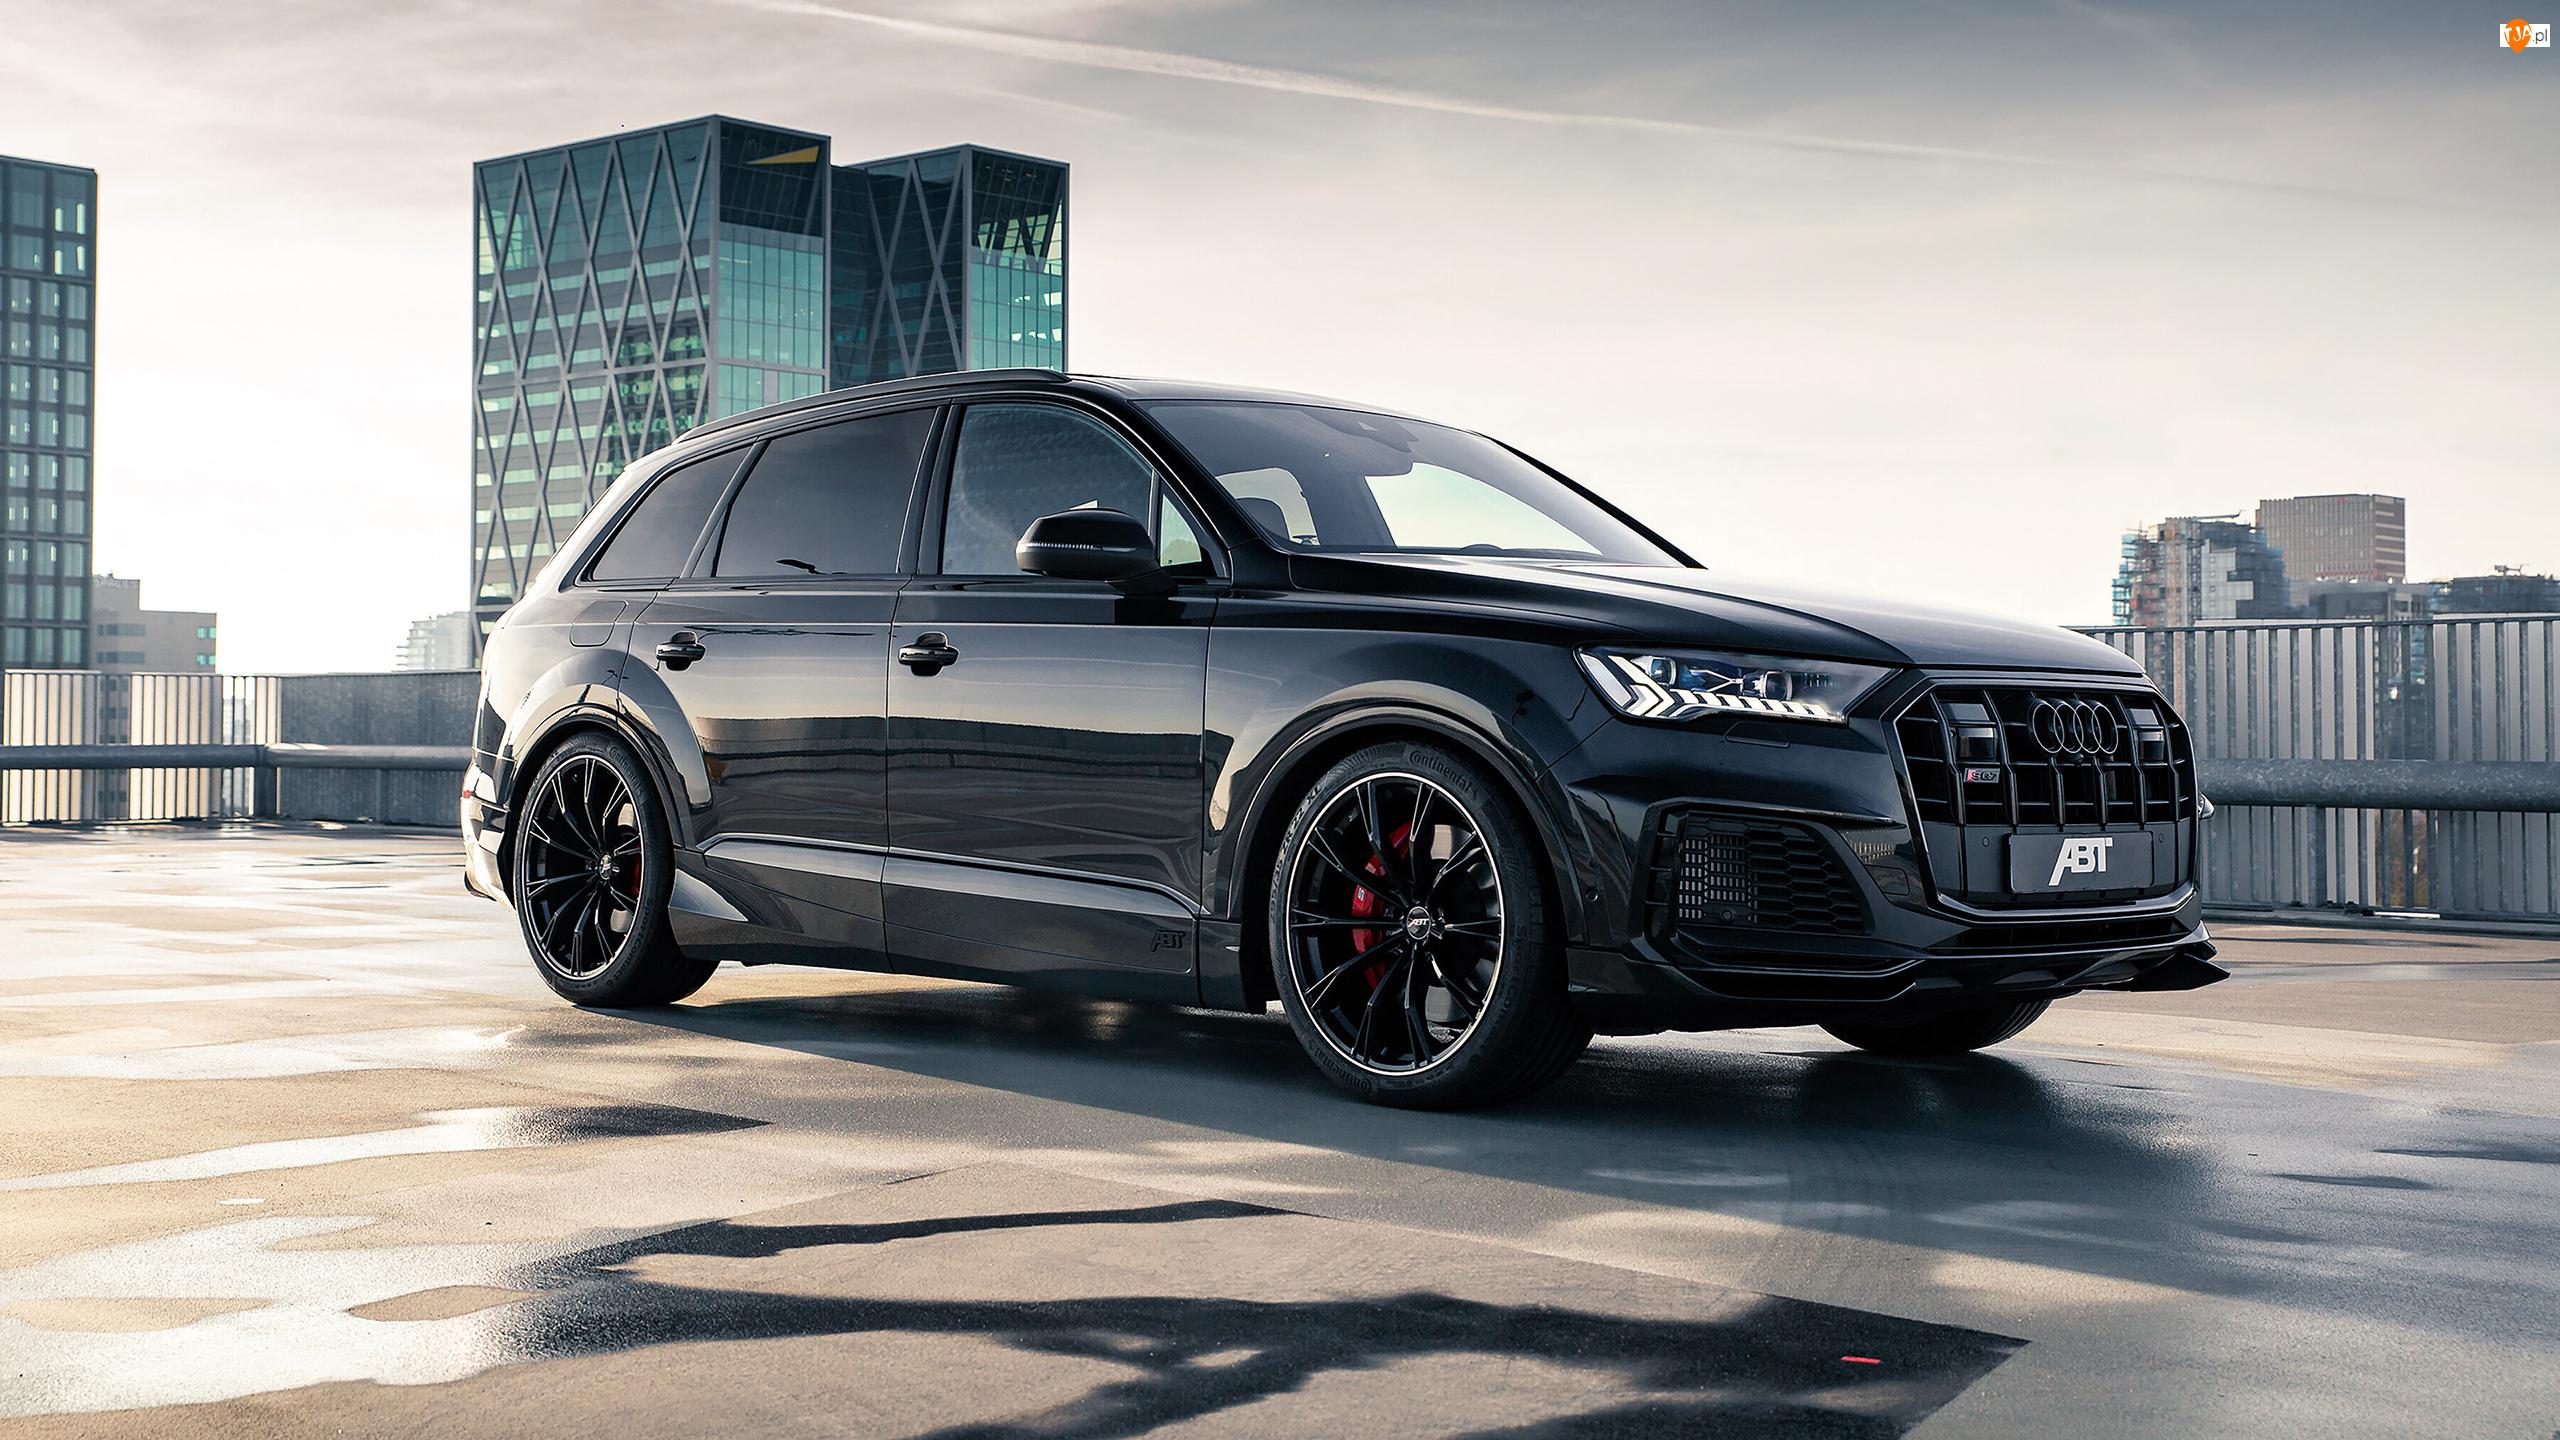 2021, Audi SQ7, ABT